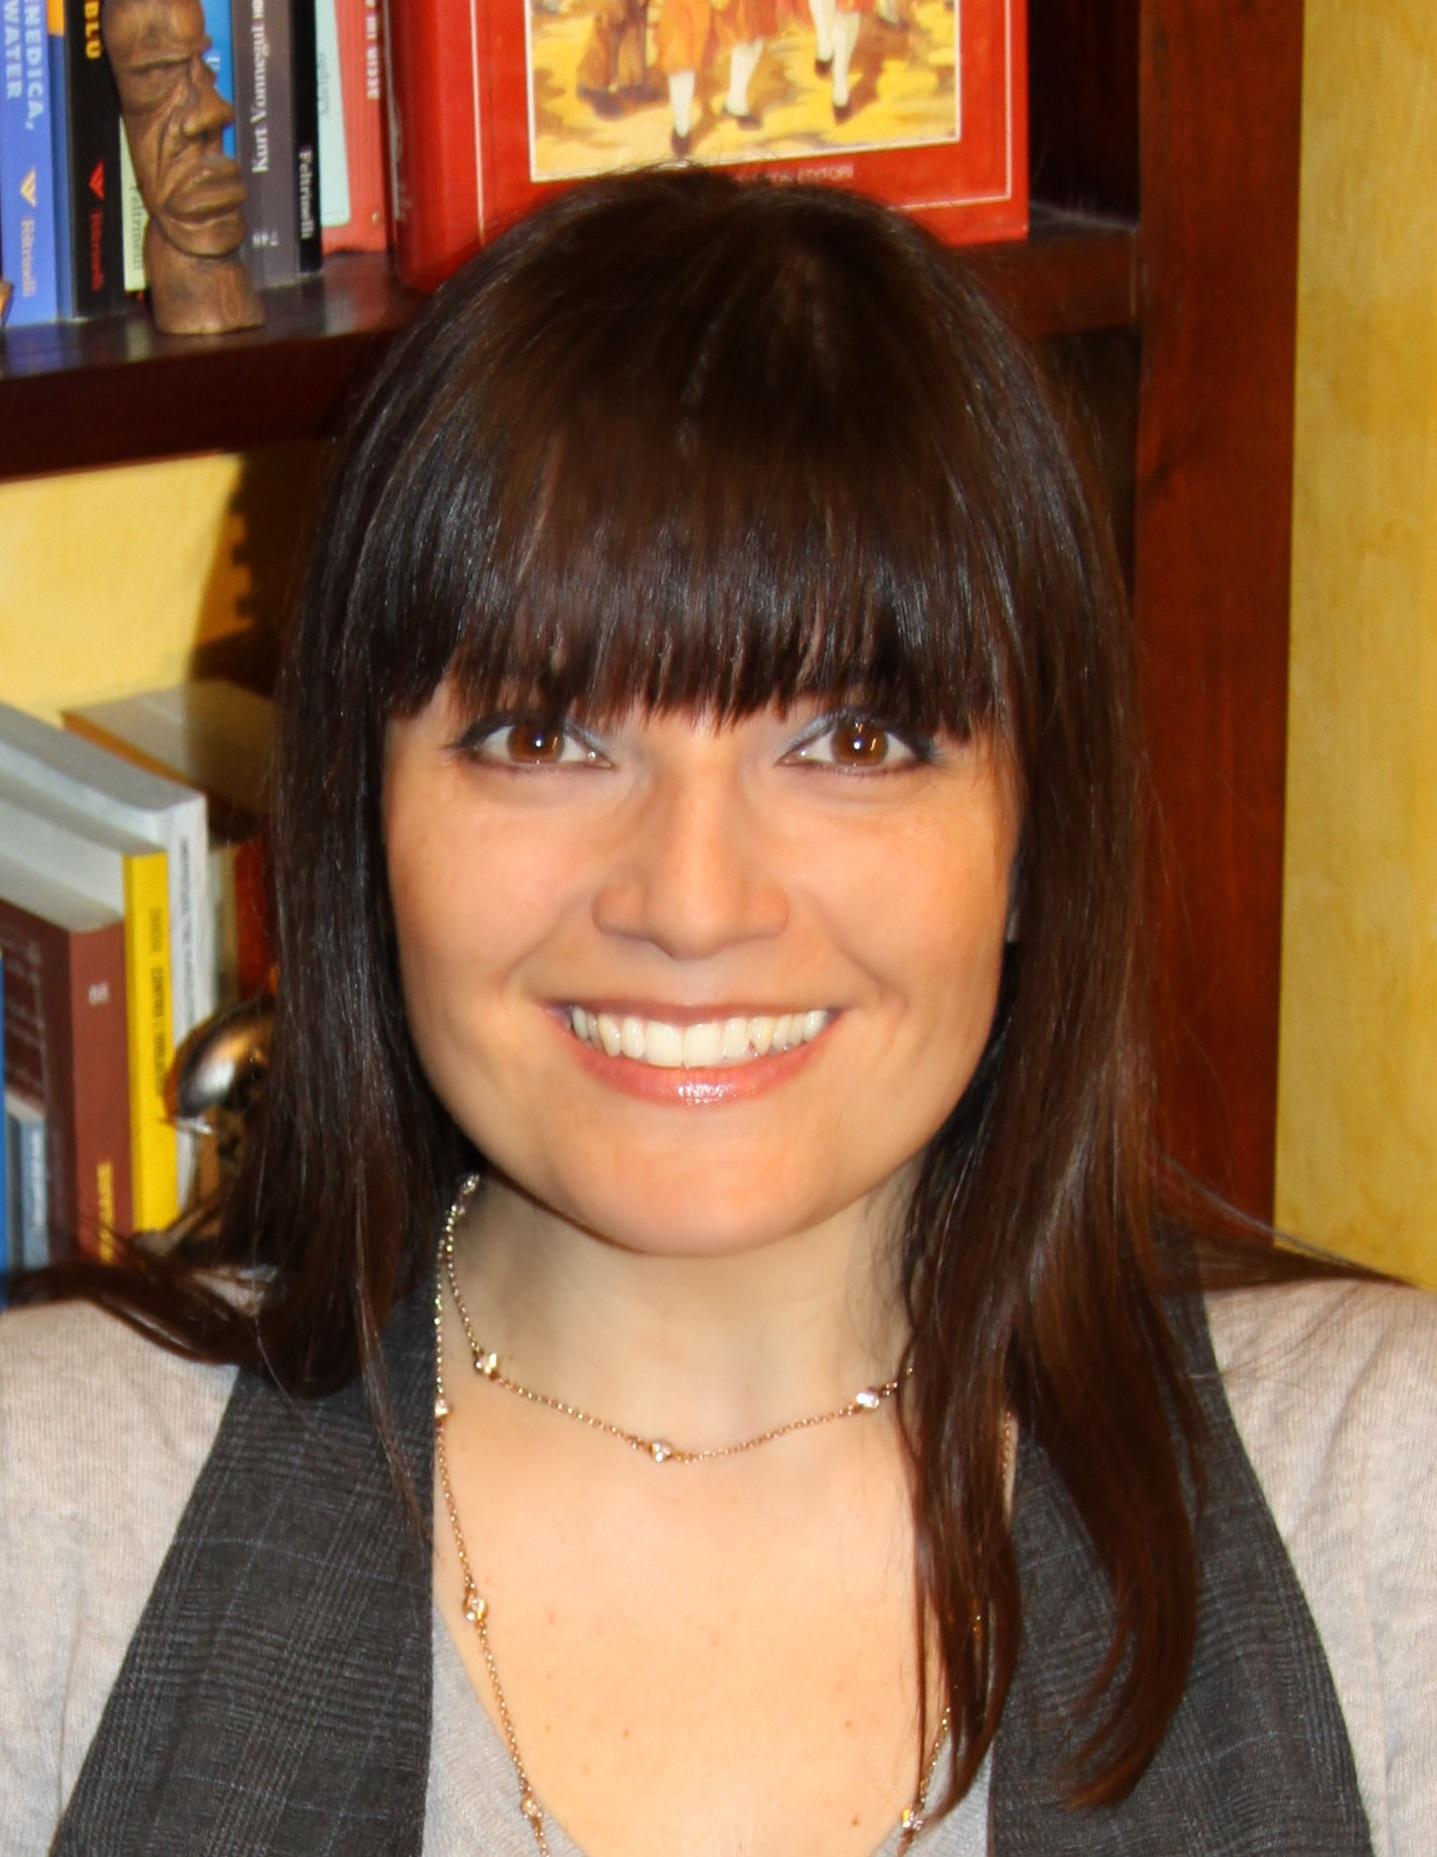 OCCITAN-PROVENÇAL – Rosella Pellerino